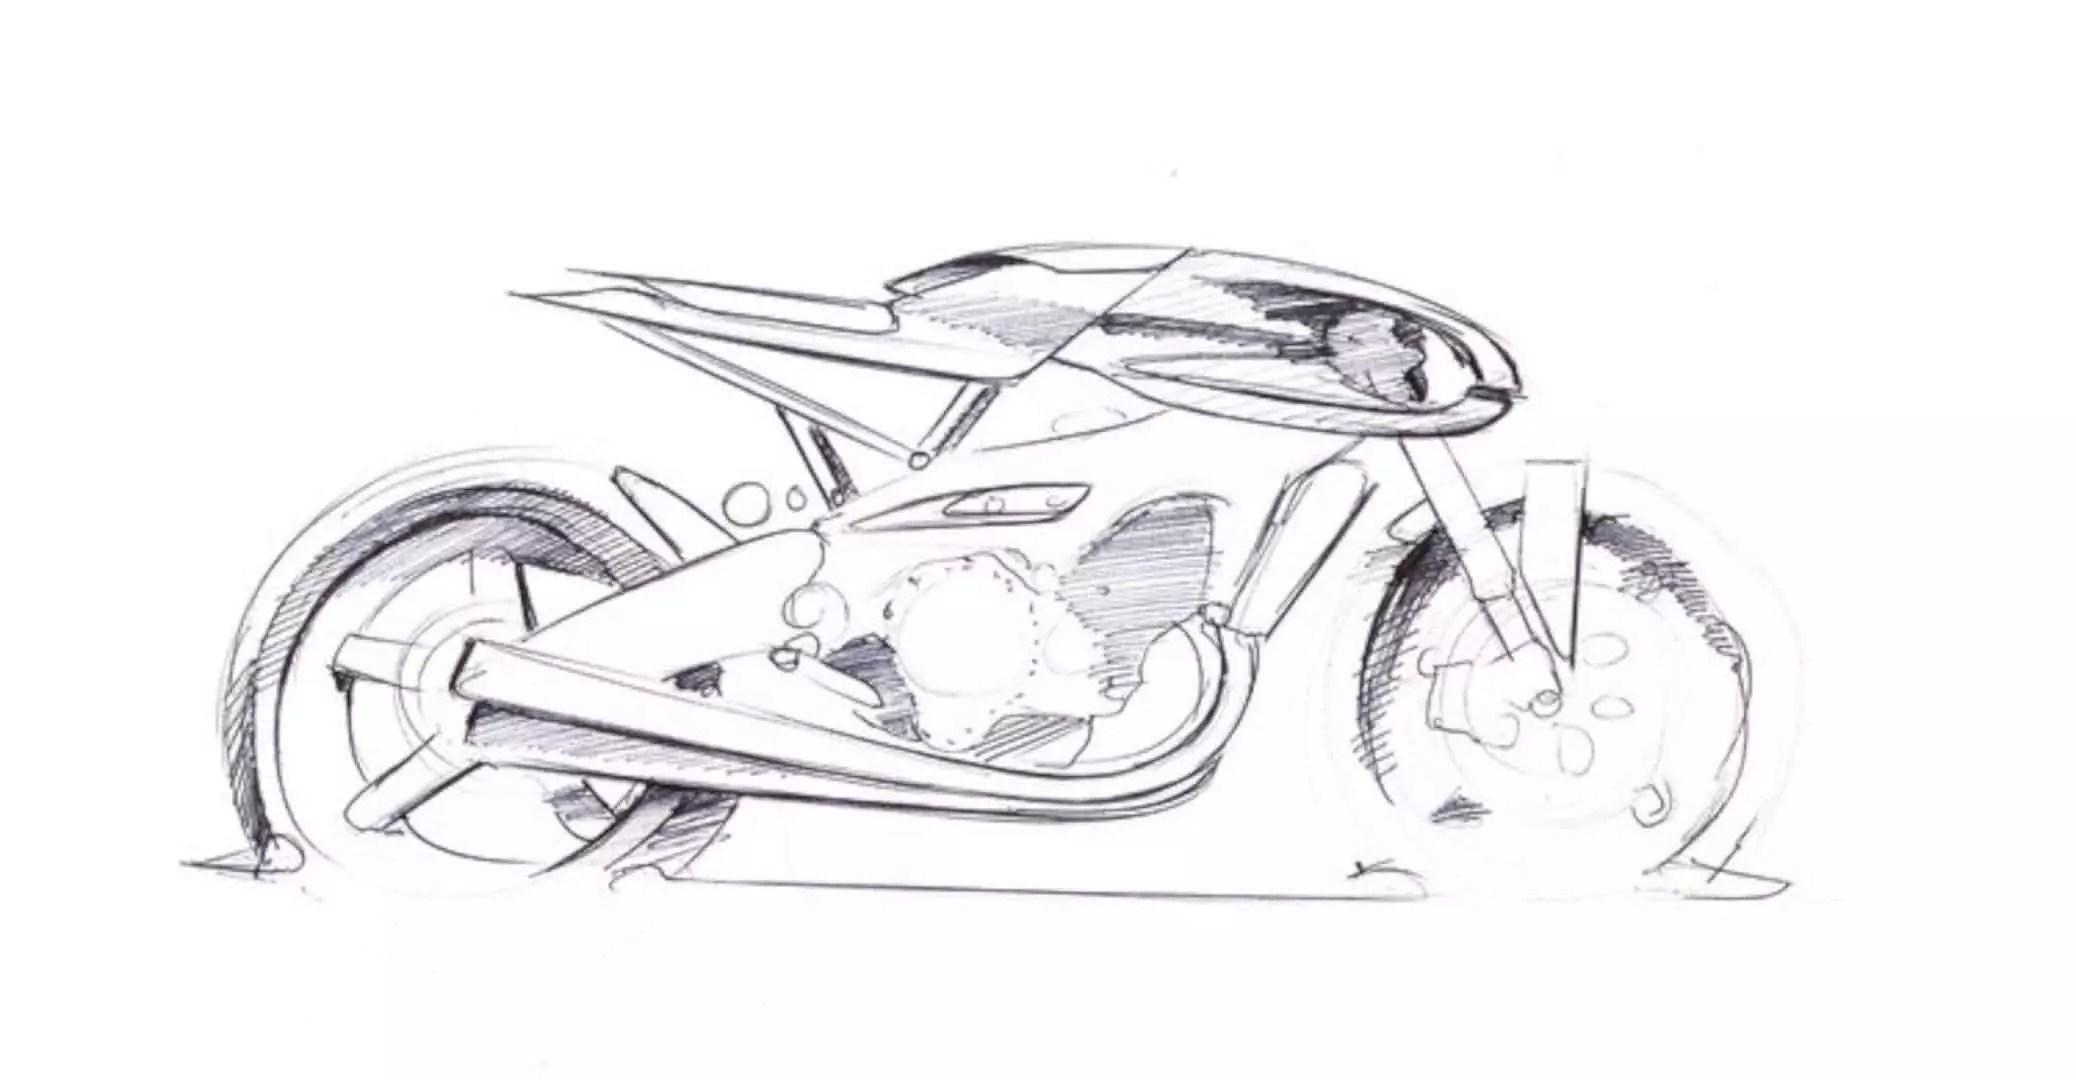 The Type 11 Concept By Auto Fabrica The Most Progressive